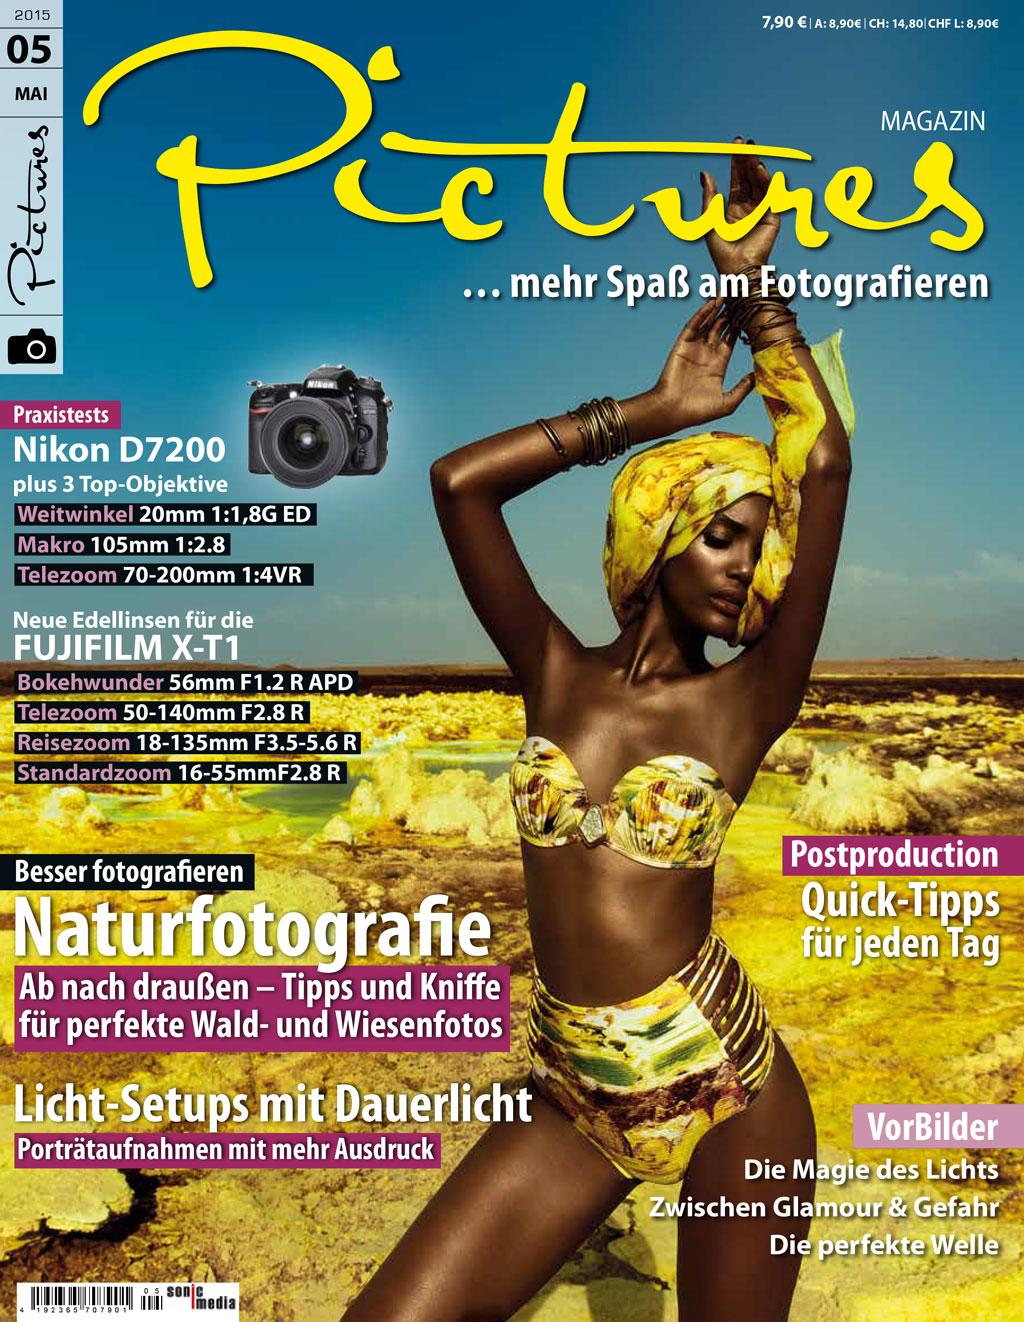 pictures_magazin_05_2015_TITEL